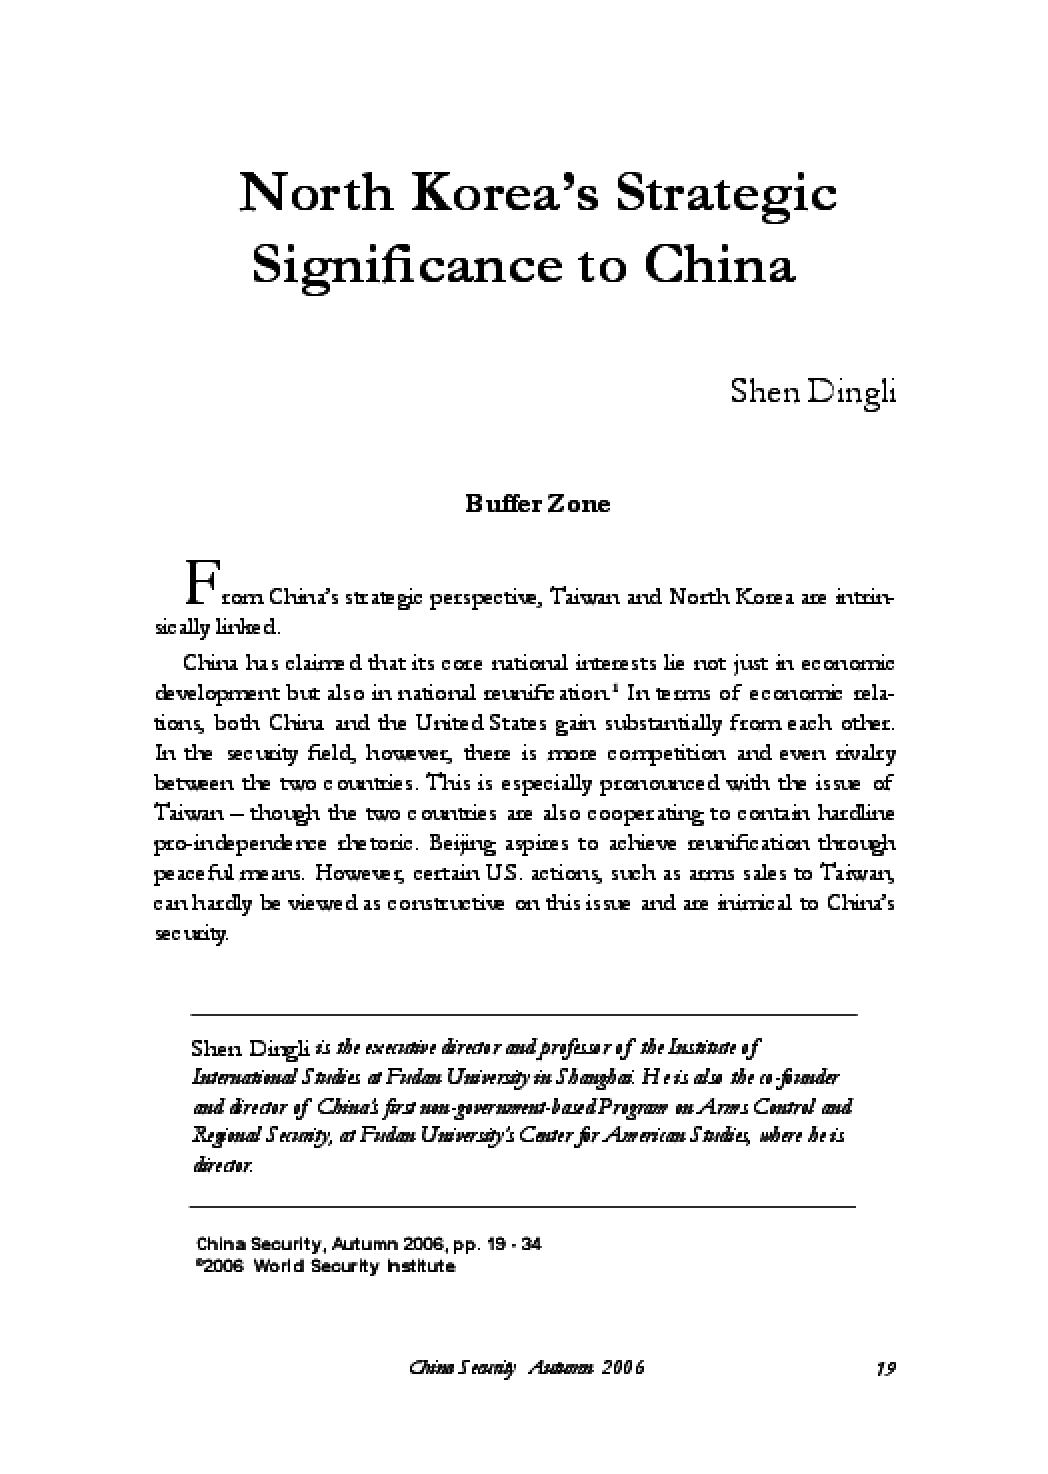 North Korea's Strategic Significance to China